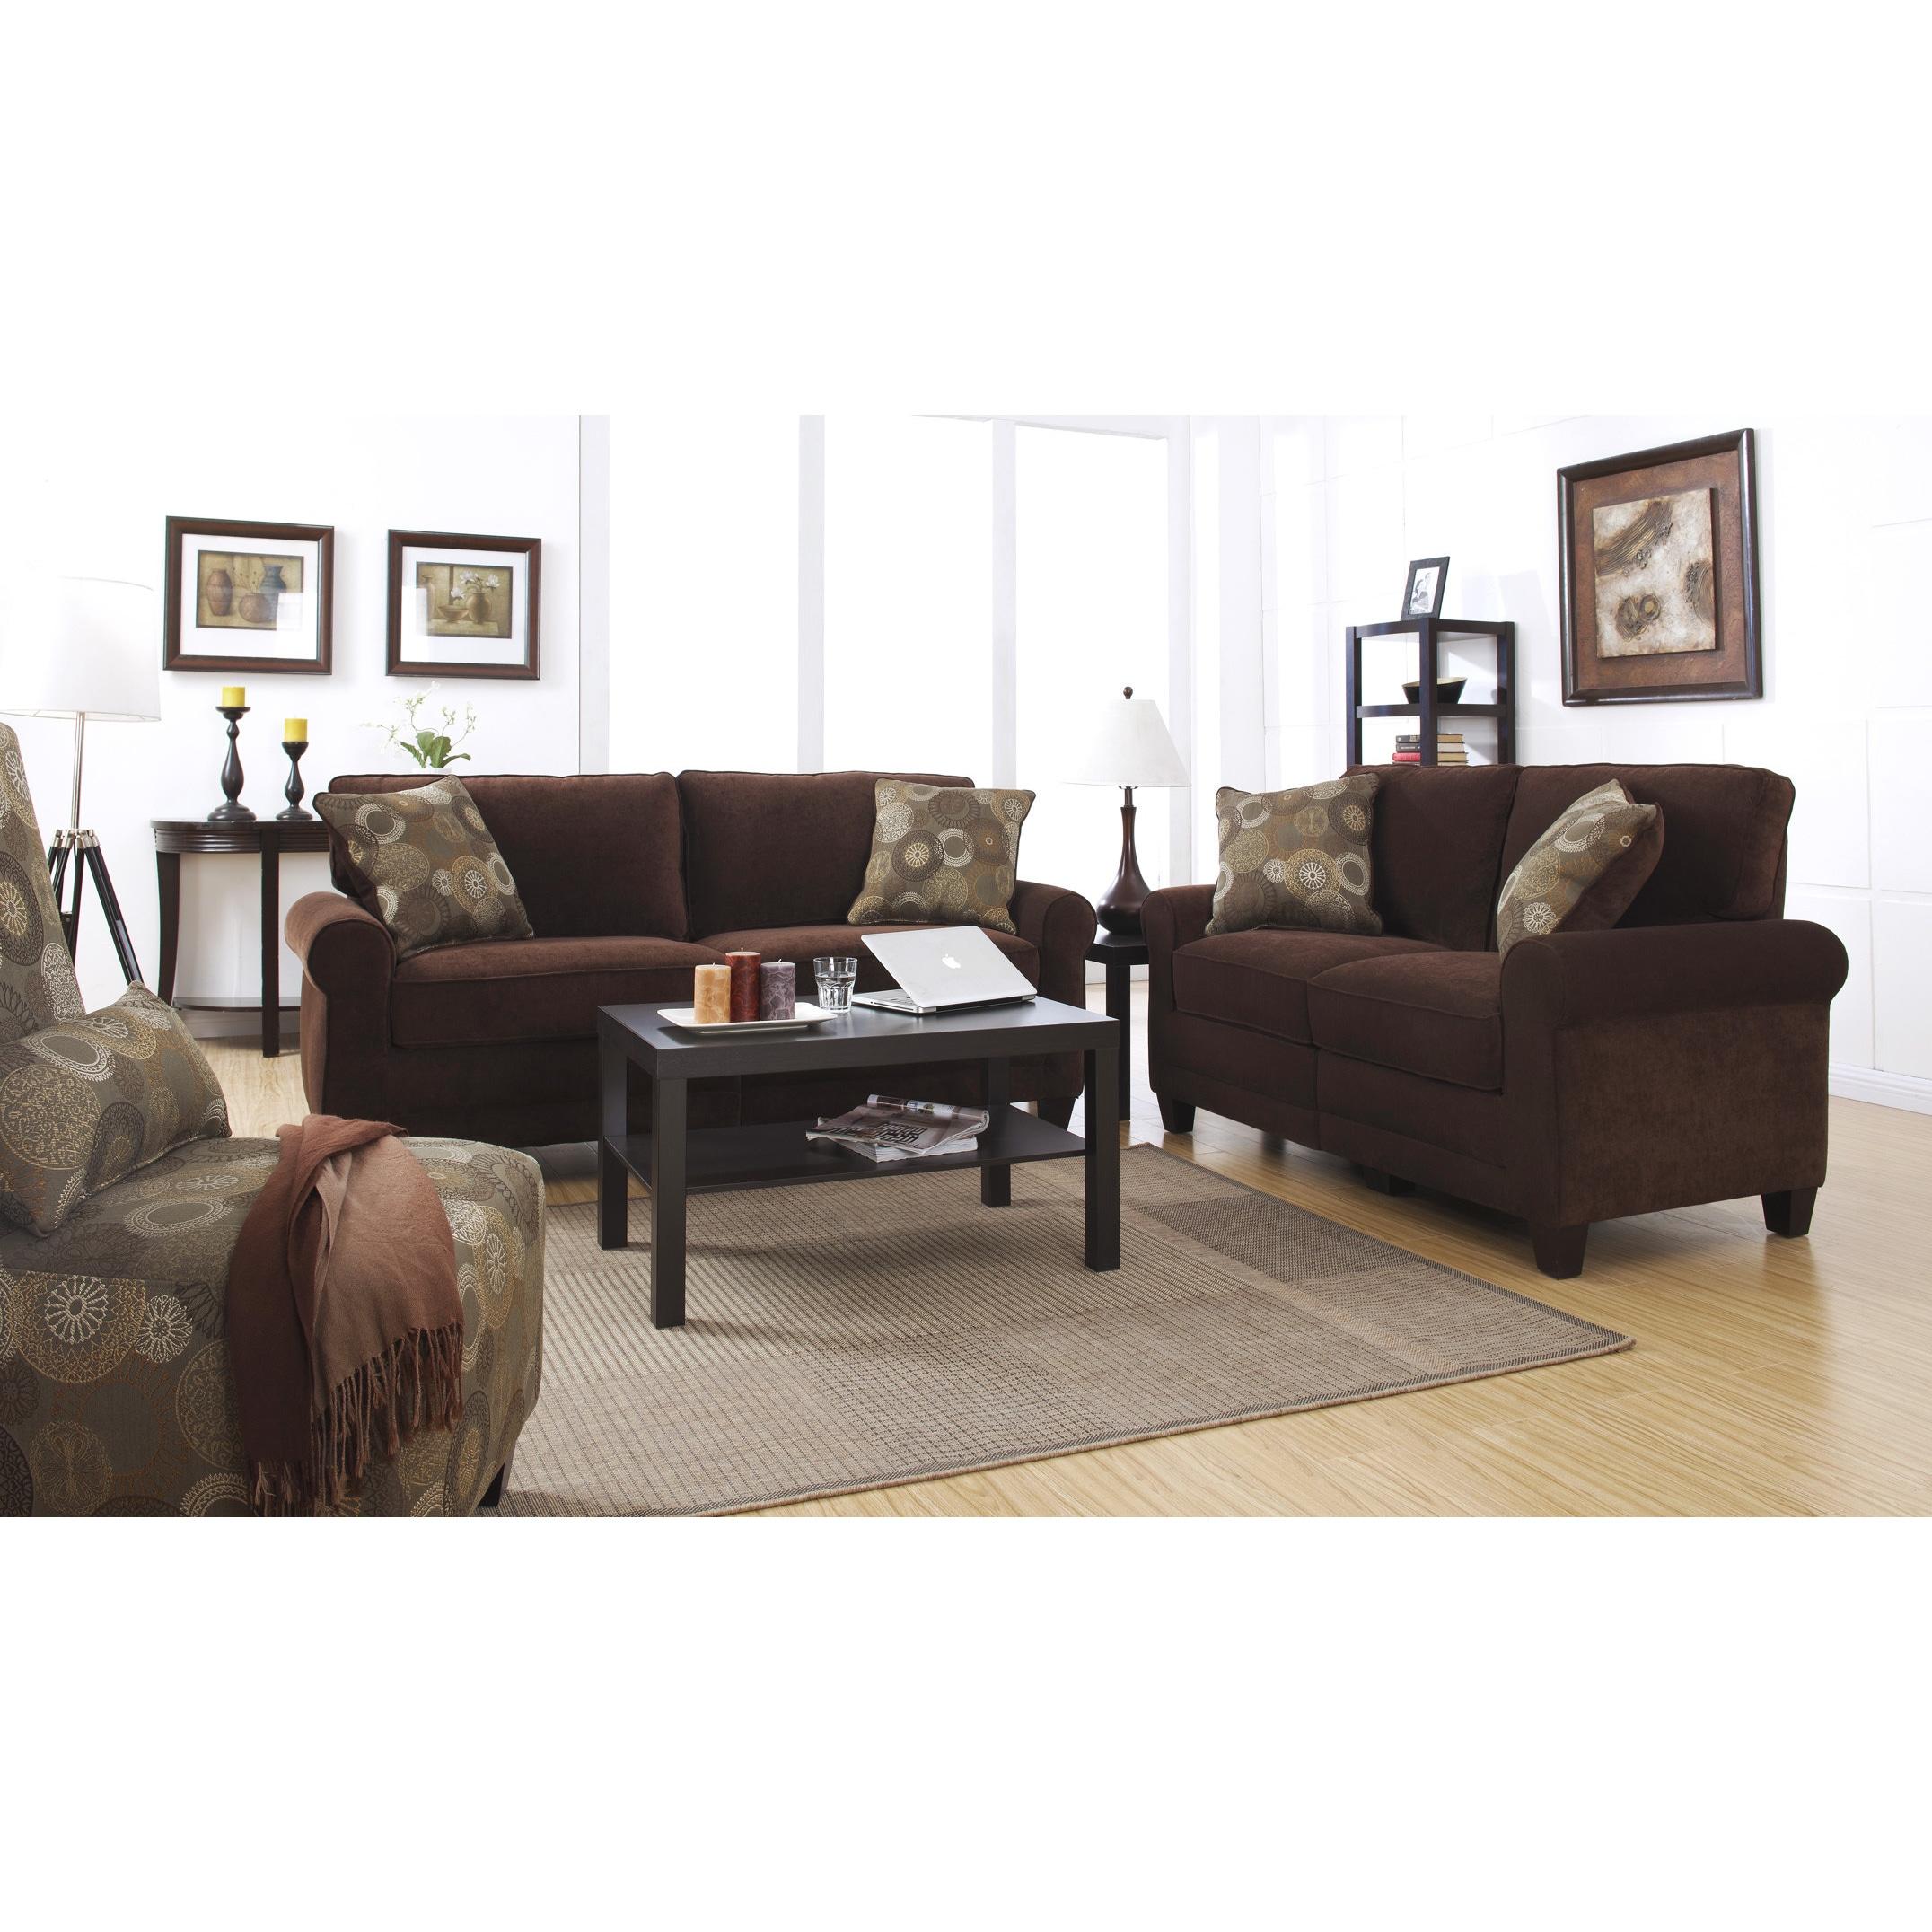 Serta RTA Copenhagen Collection 73-inch Rye Brown Sofa (S...